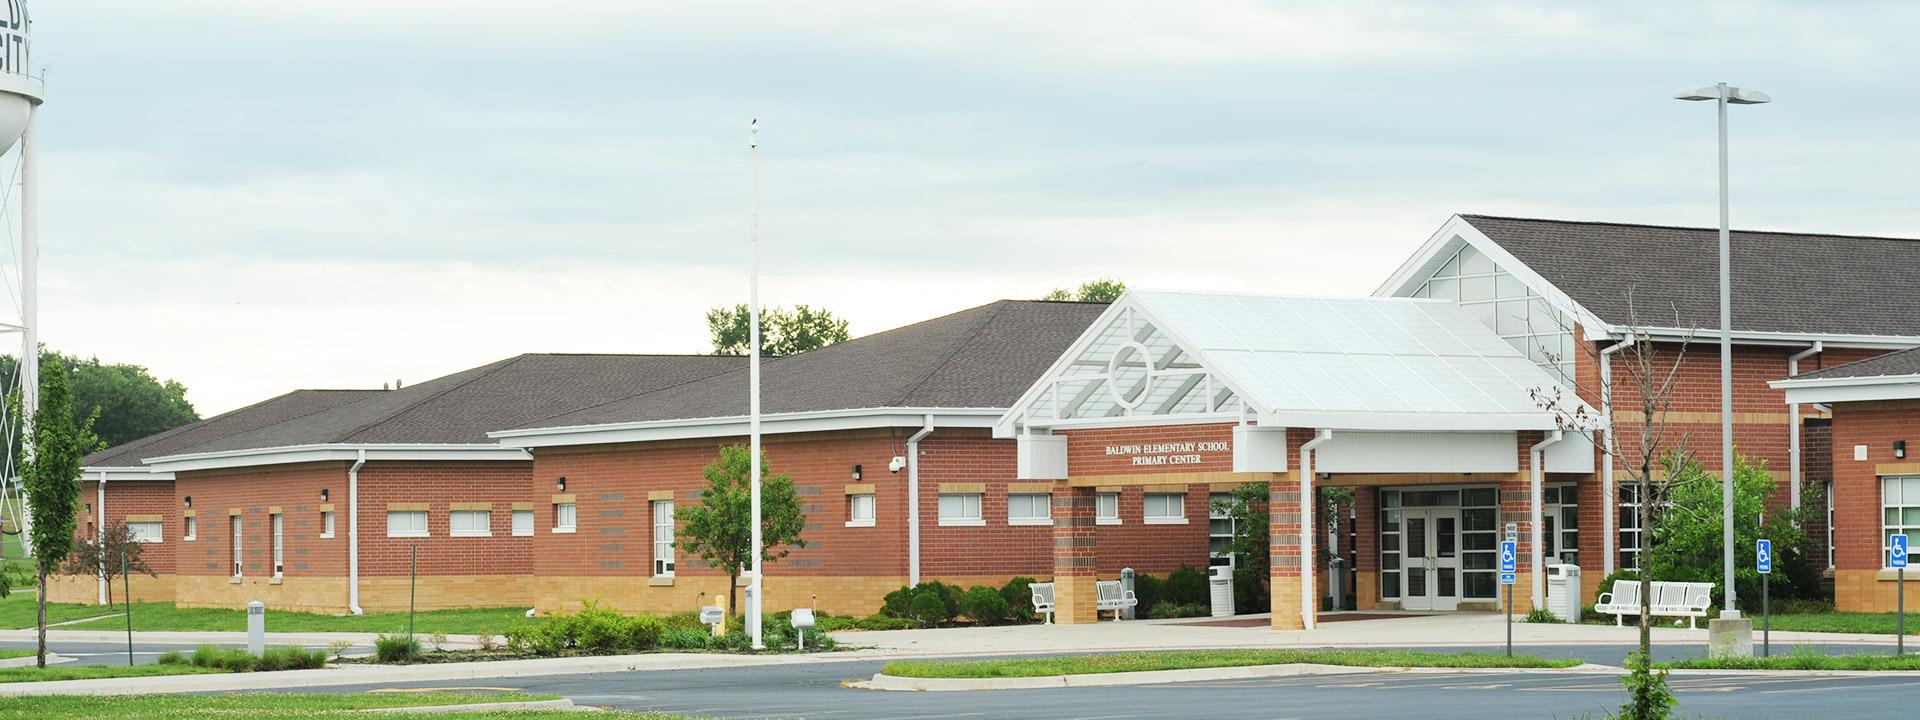 Photo of the Baldwin Elementary School Primary Center building exterior